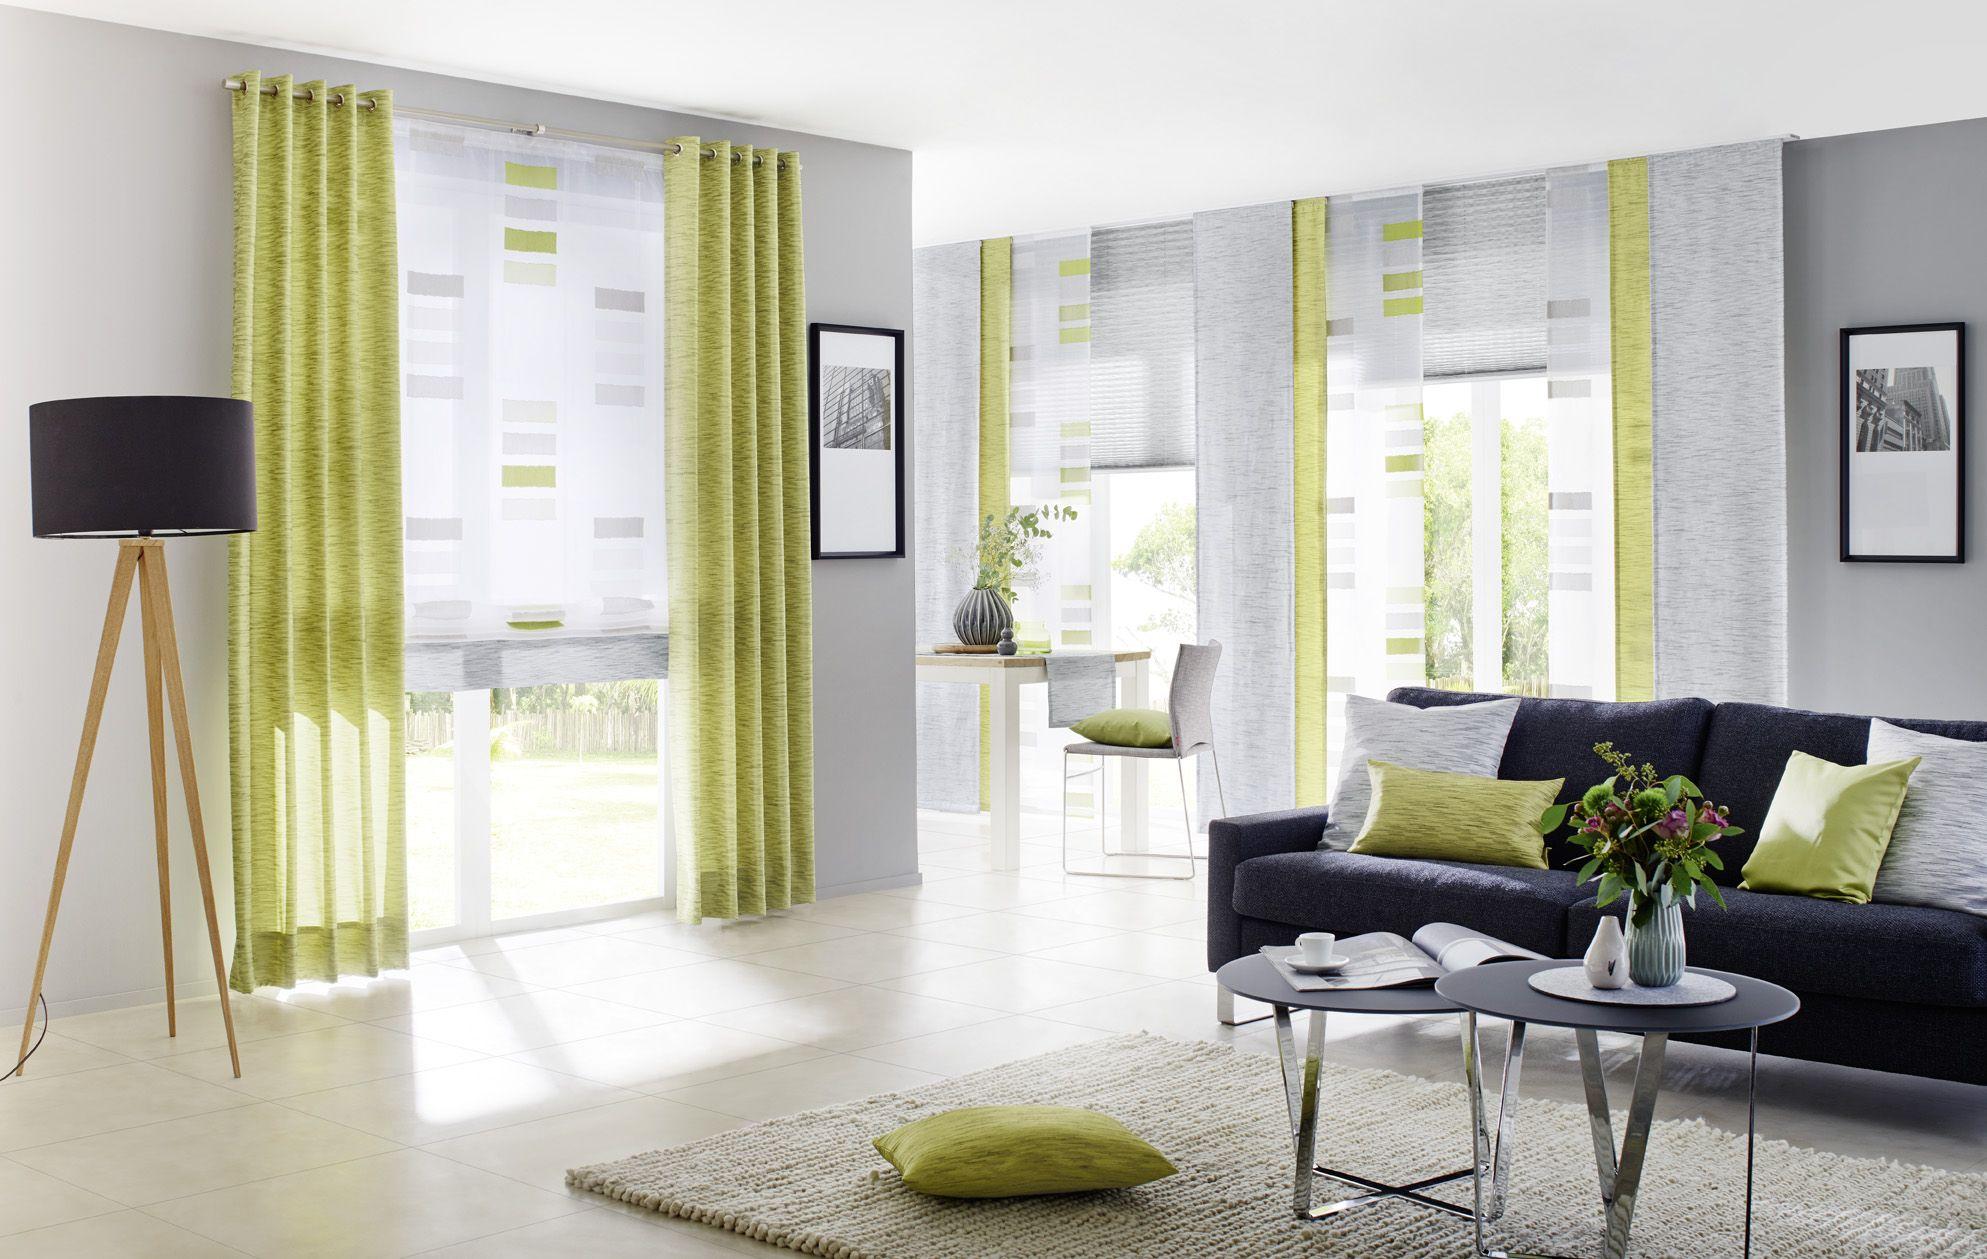 fenster shantung grey gardinen dekostoffe vorhang wohnstoffe plissees rollos jalousien. Black Bedroom Furniture Sets. Home Design Ideas